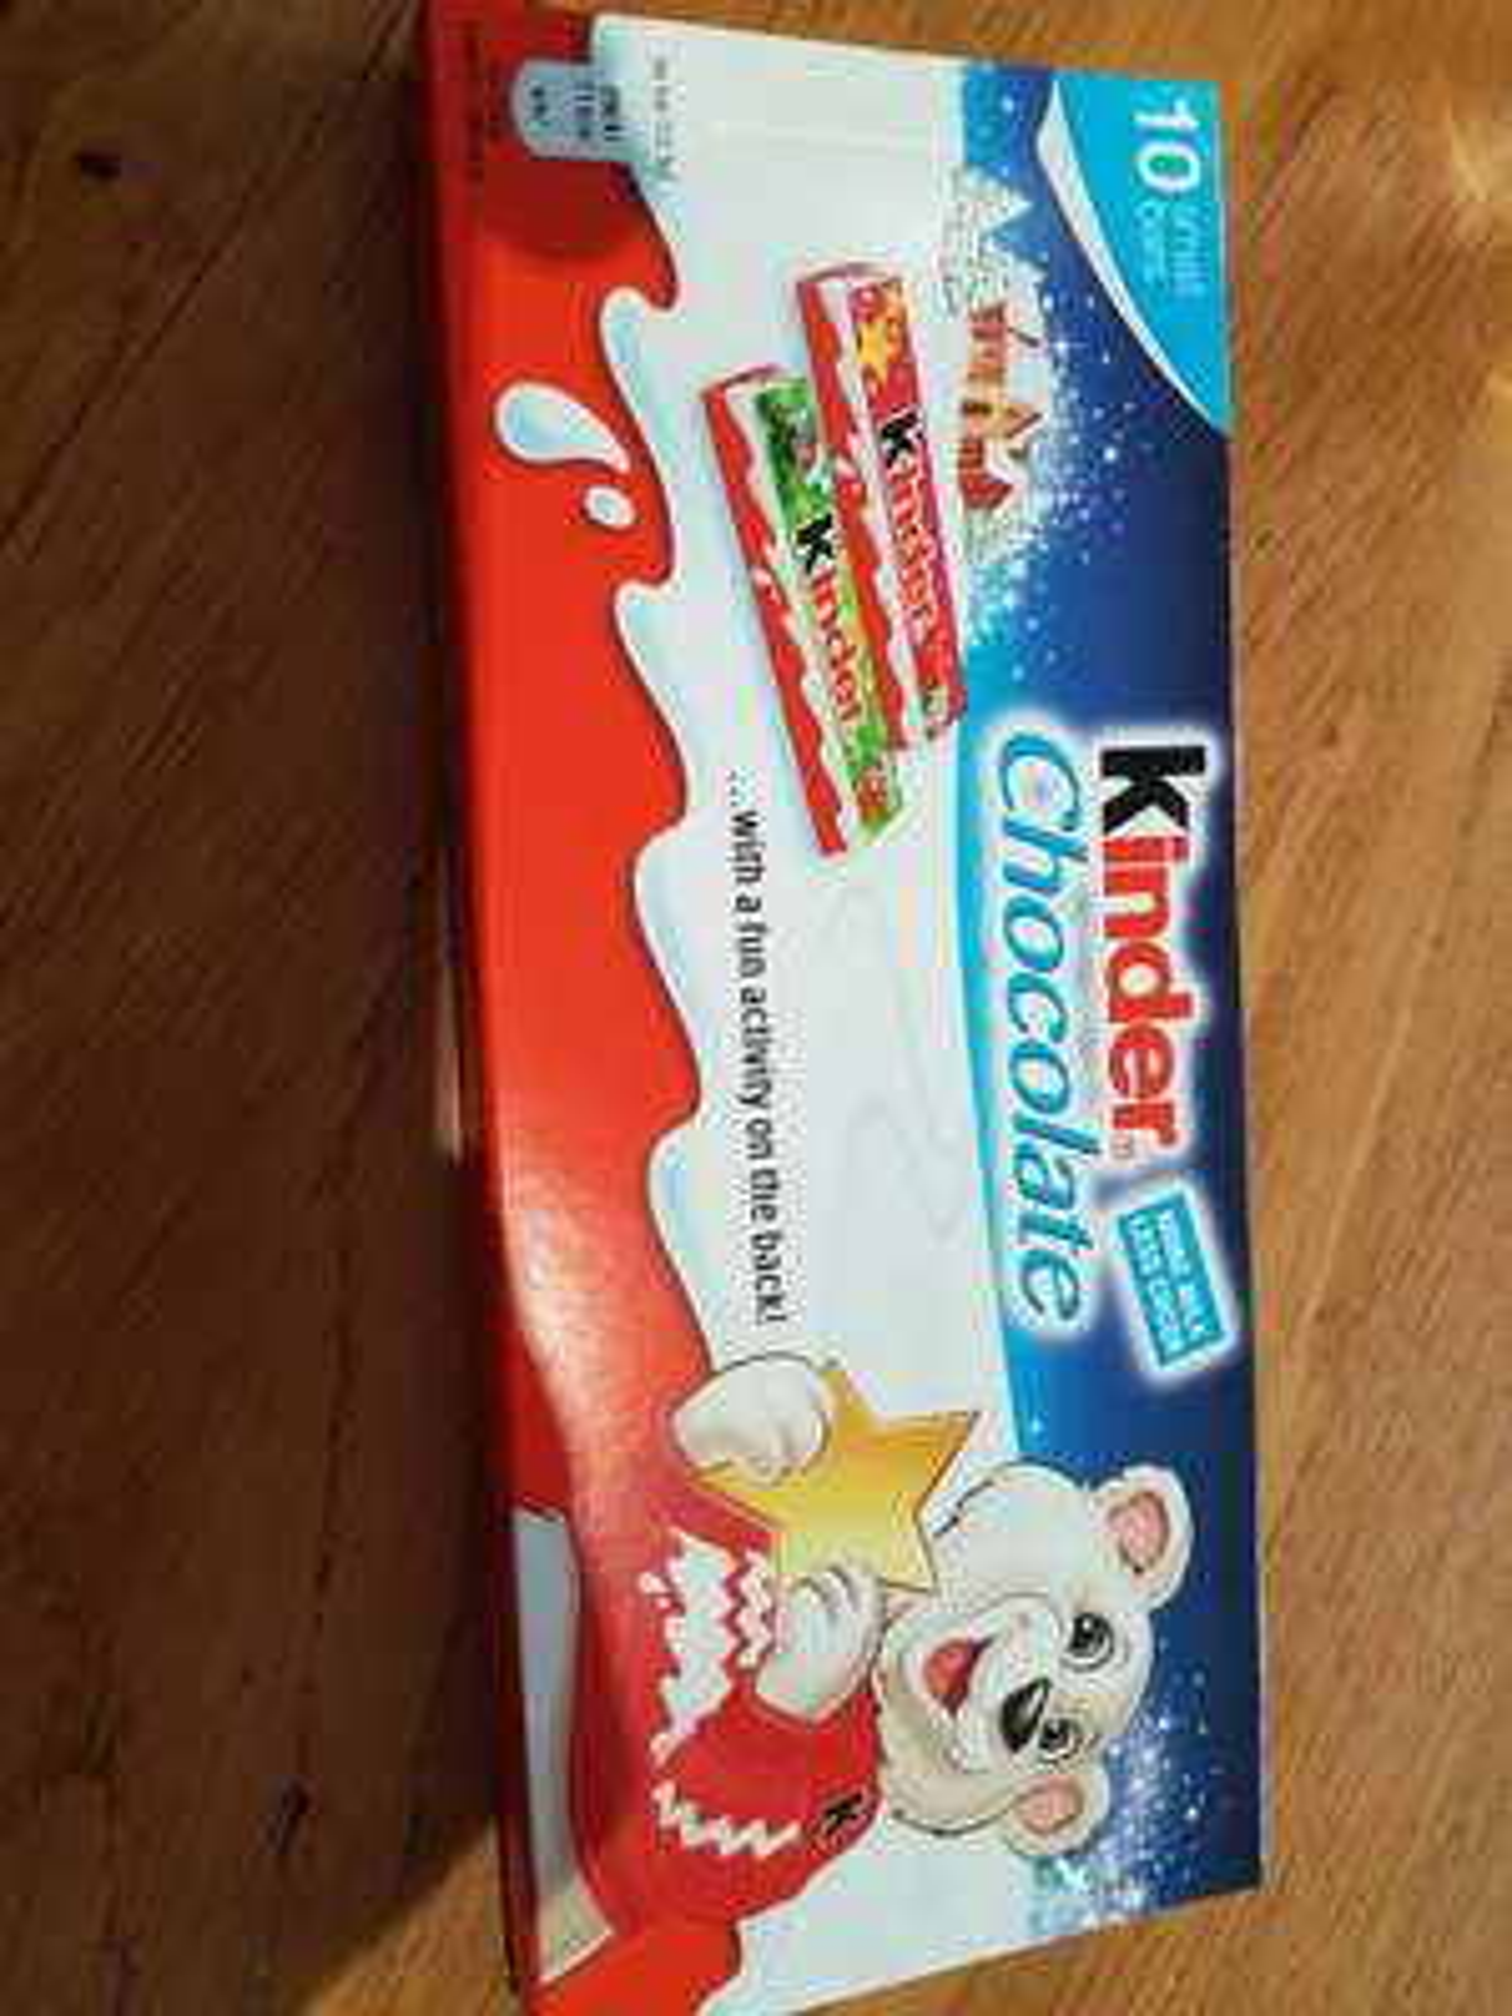 Kinder Chocolate - Co-op - 50p